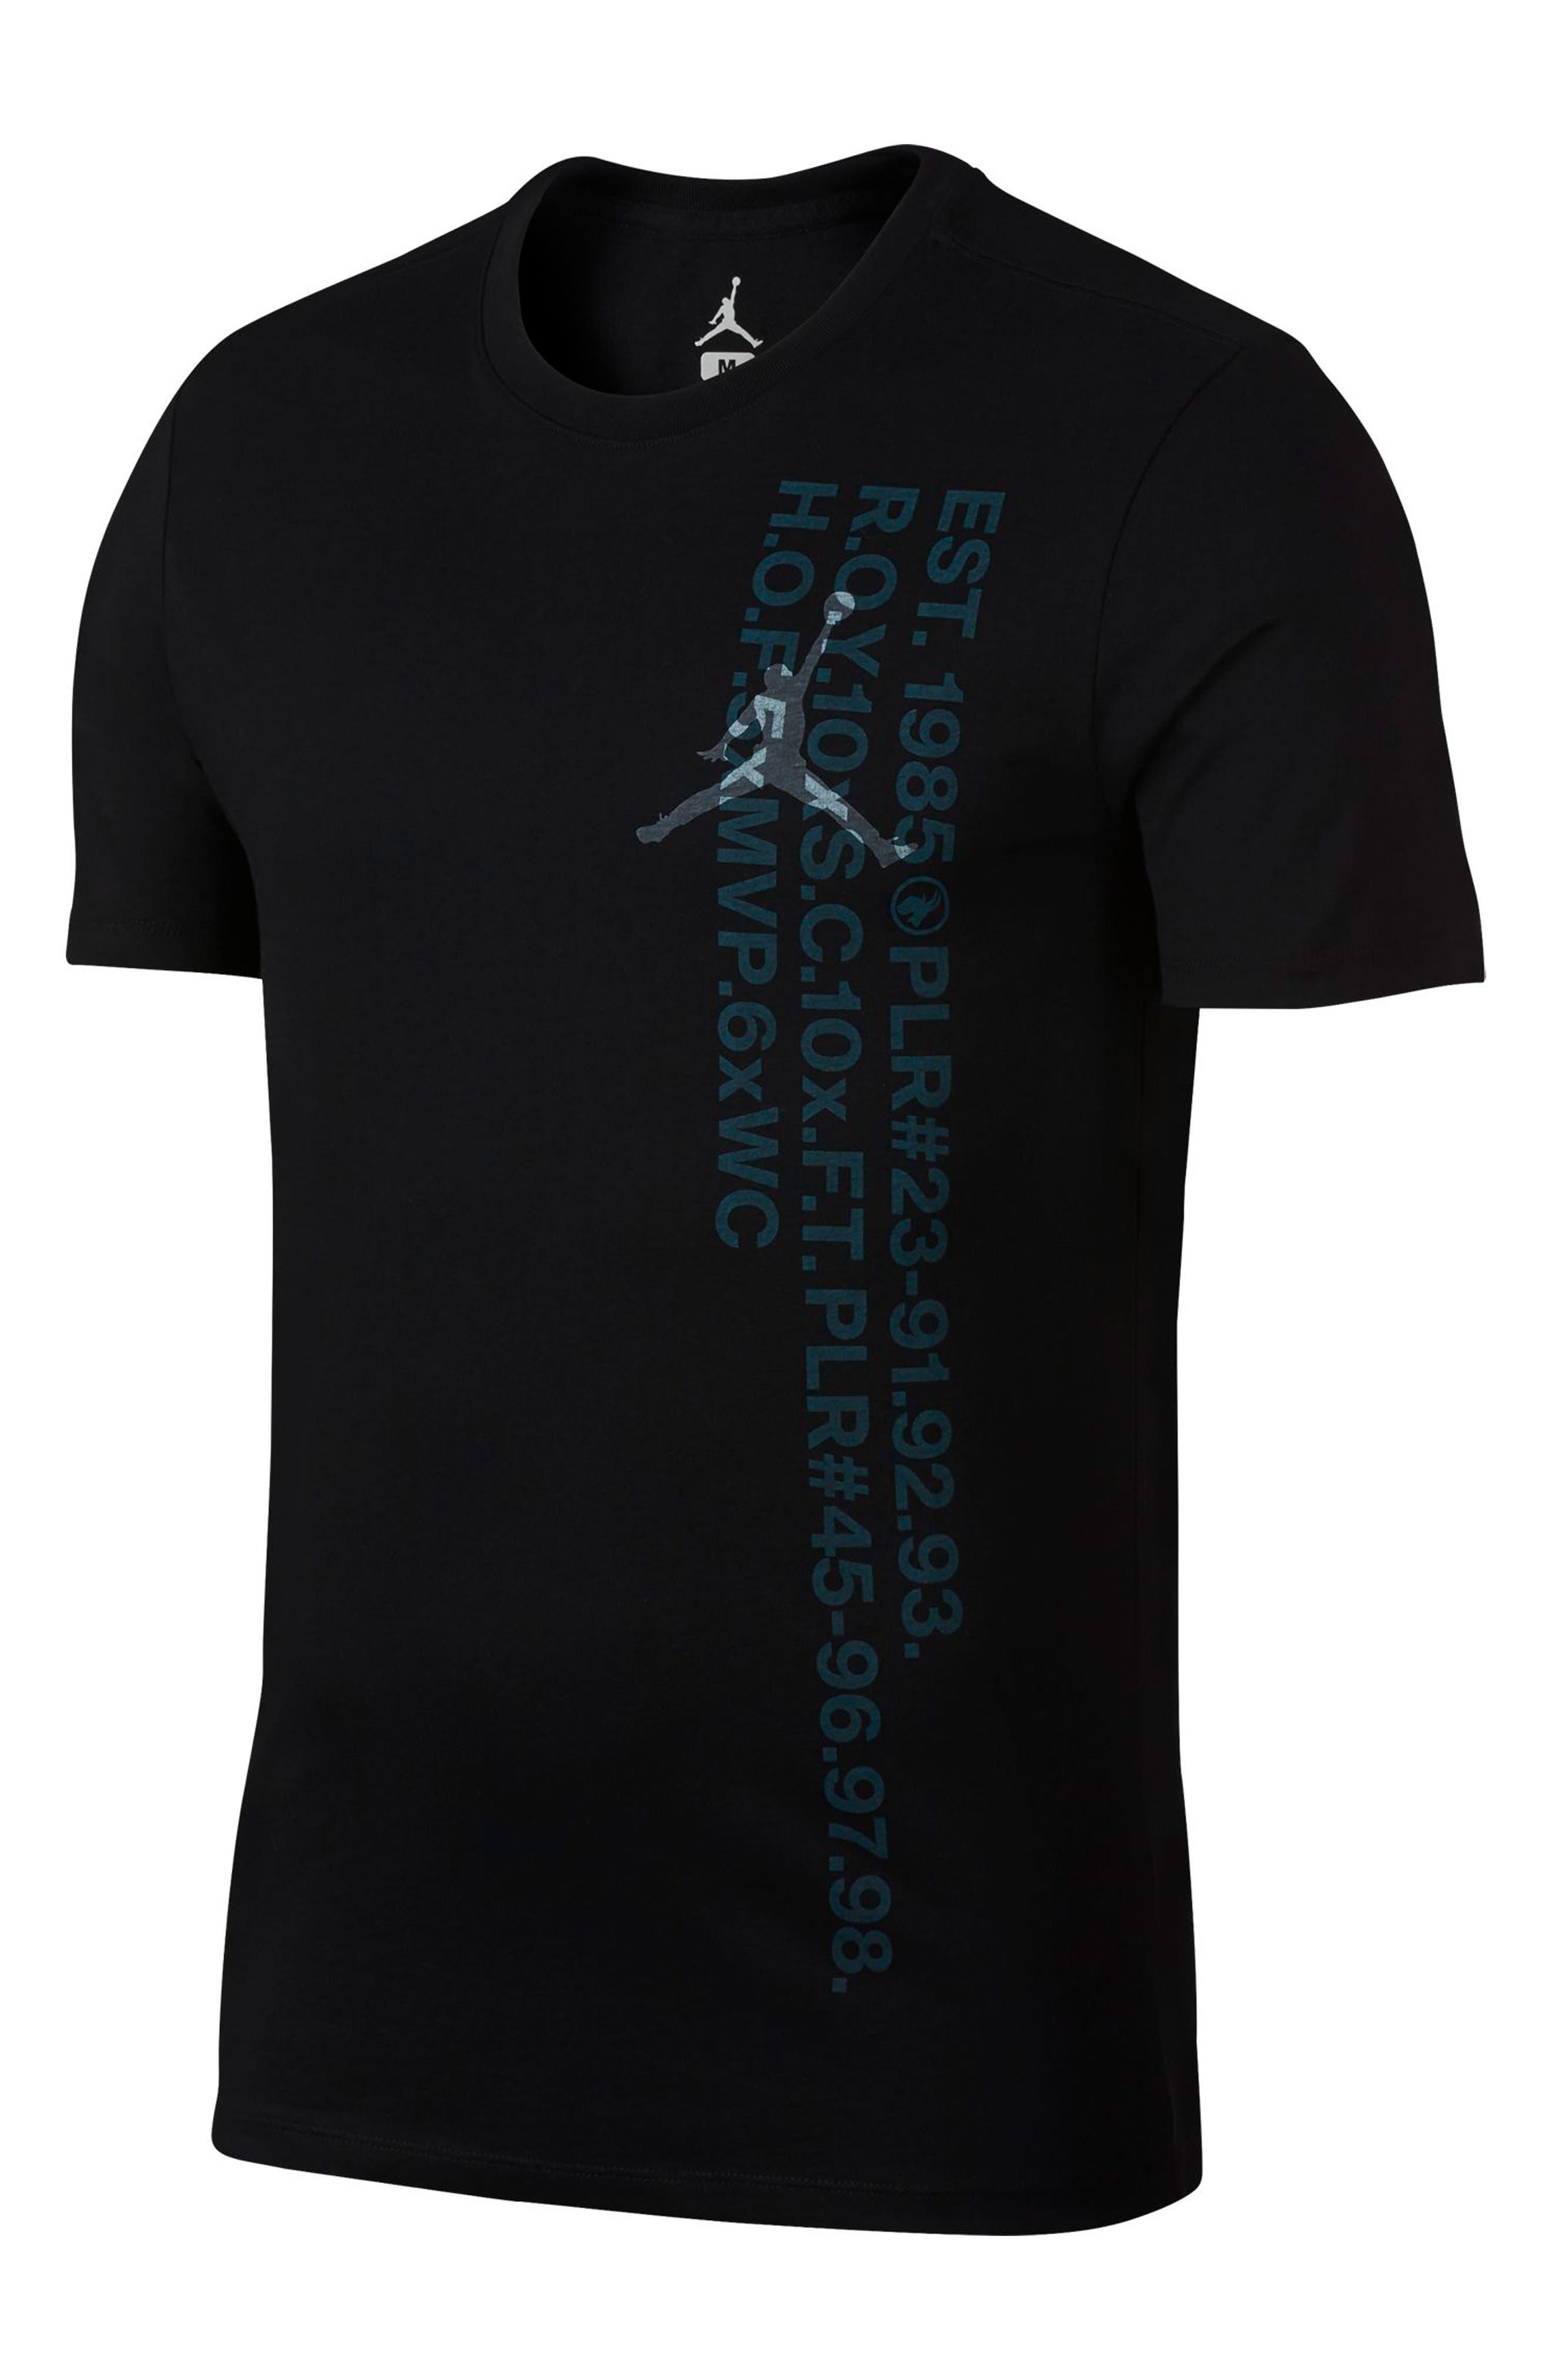 Jordan Sportswear Greatest Graphic T-Shirt, Black